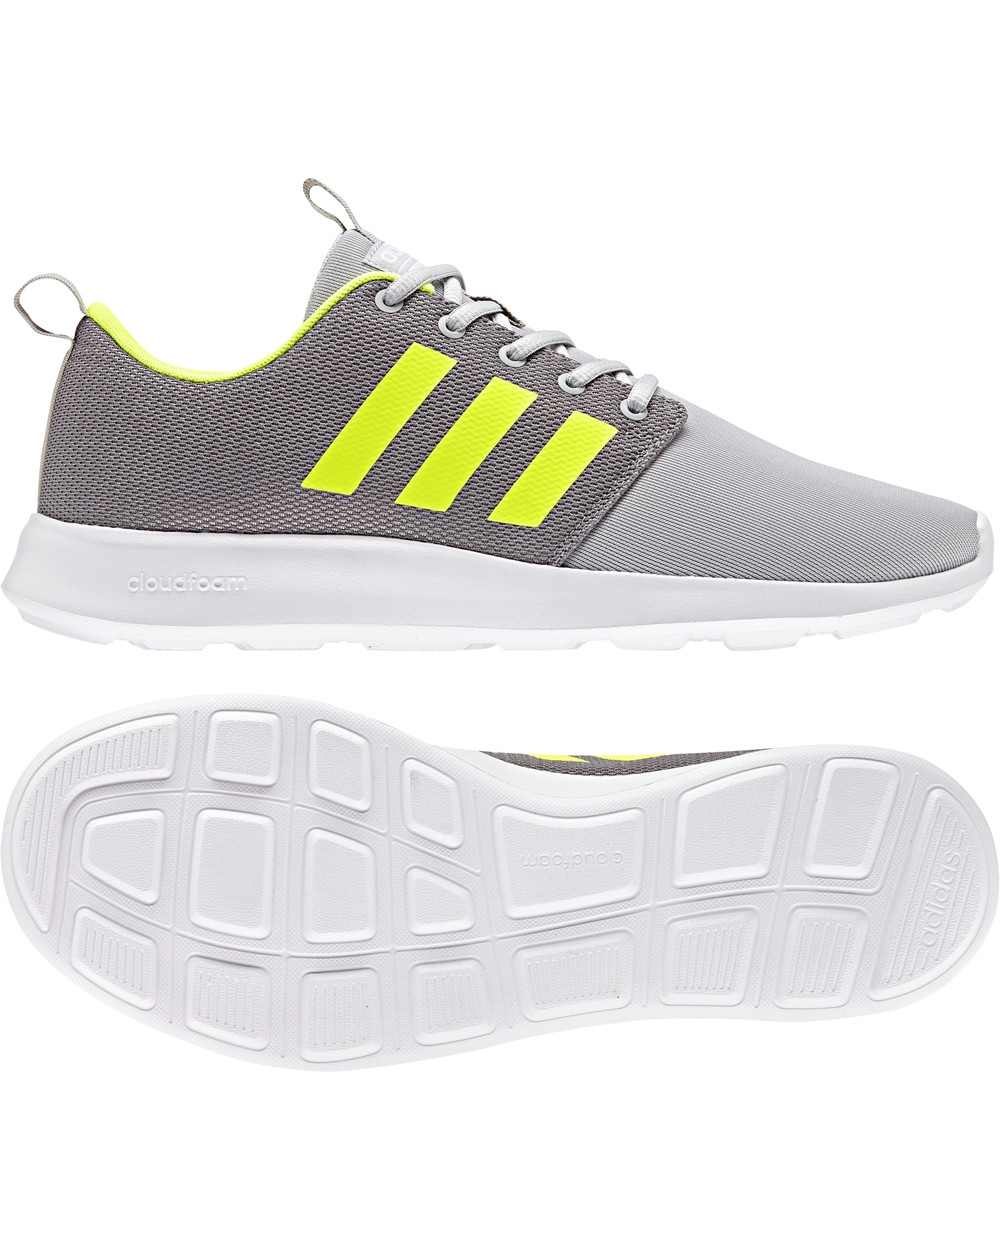 Adidas Tennis Scarpe Running Swift Racer Neo Sneakers Grigio Sportive Cf vxBrqvwI